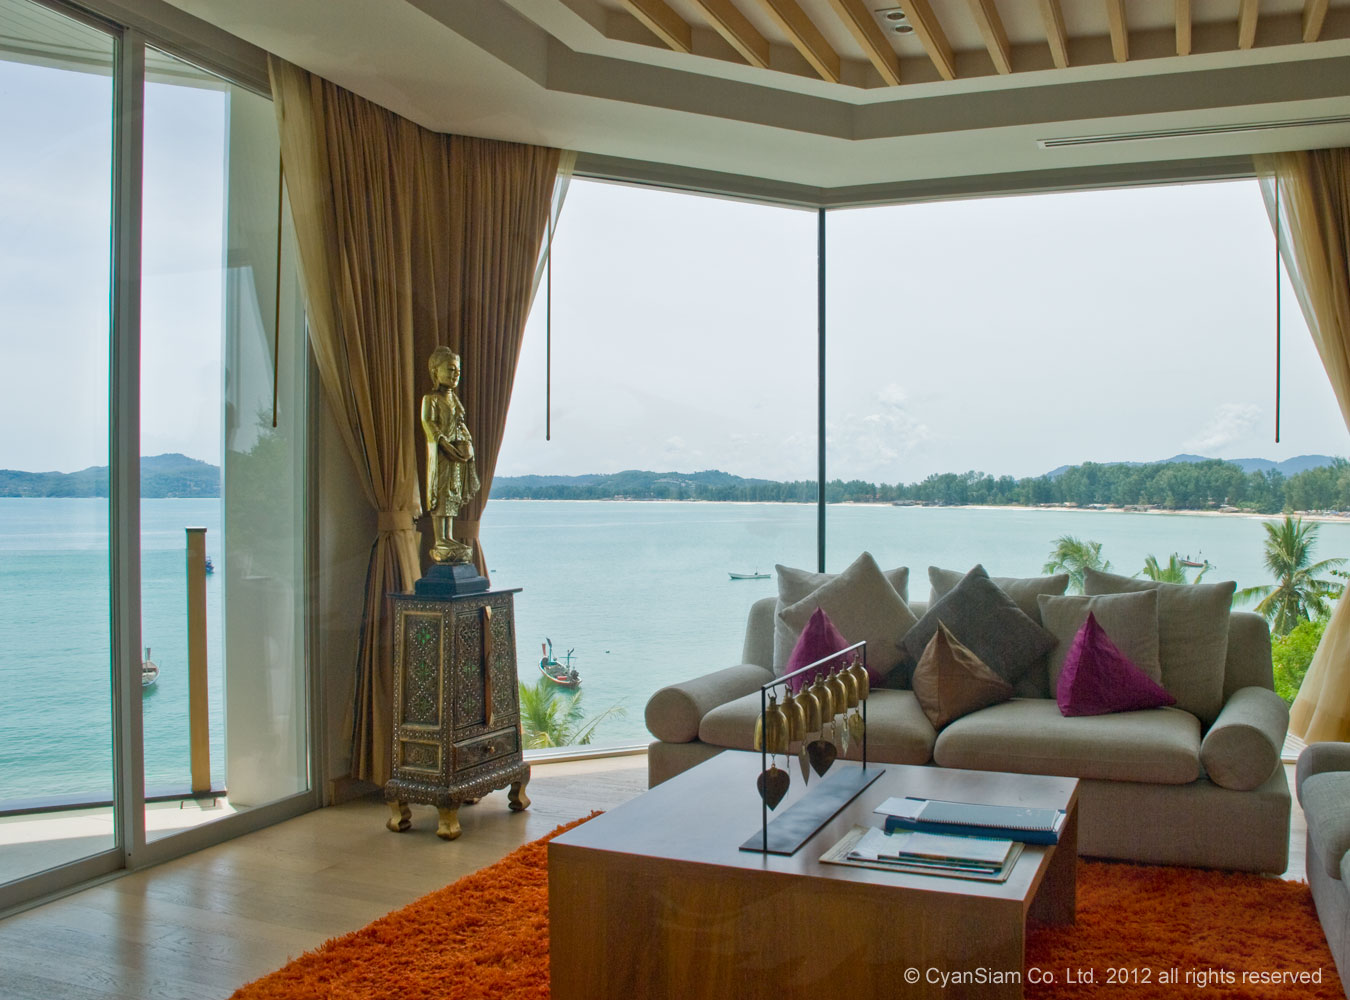 konos penthouse bang tao phuket   phuket holiday villa rentals